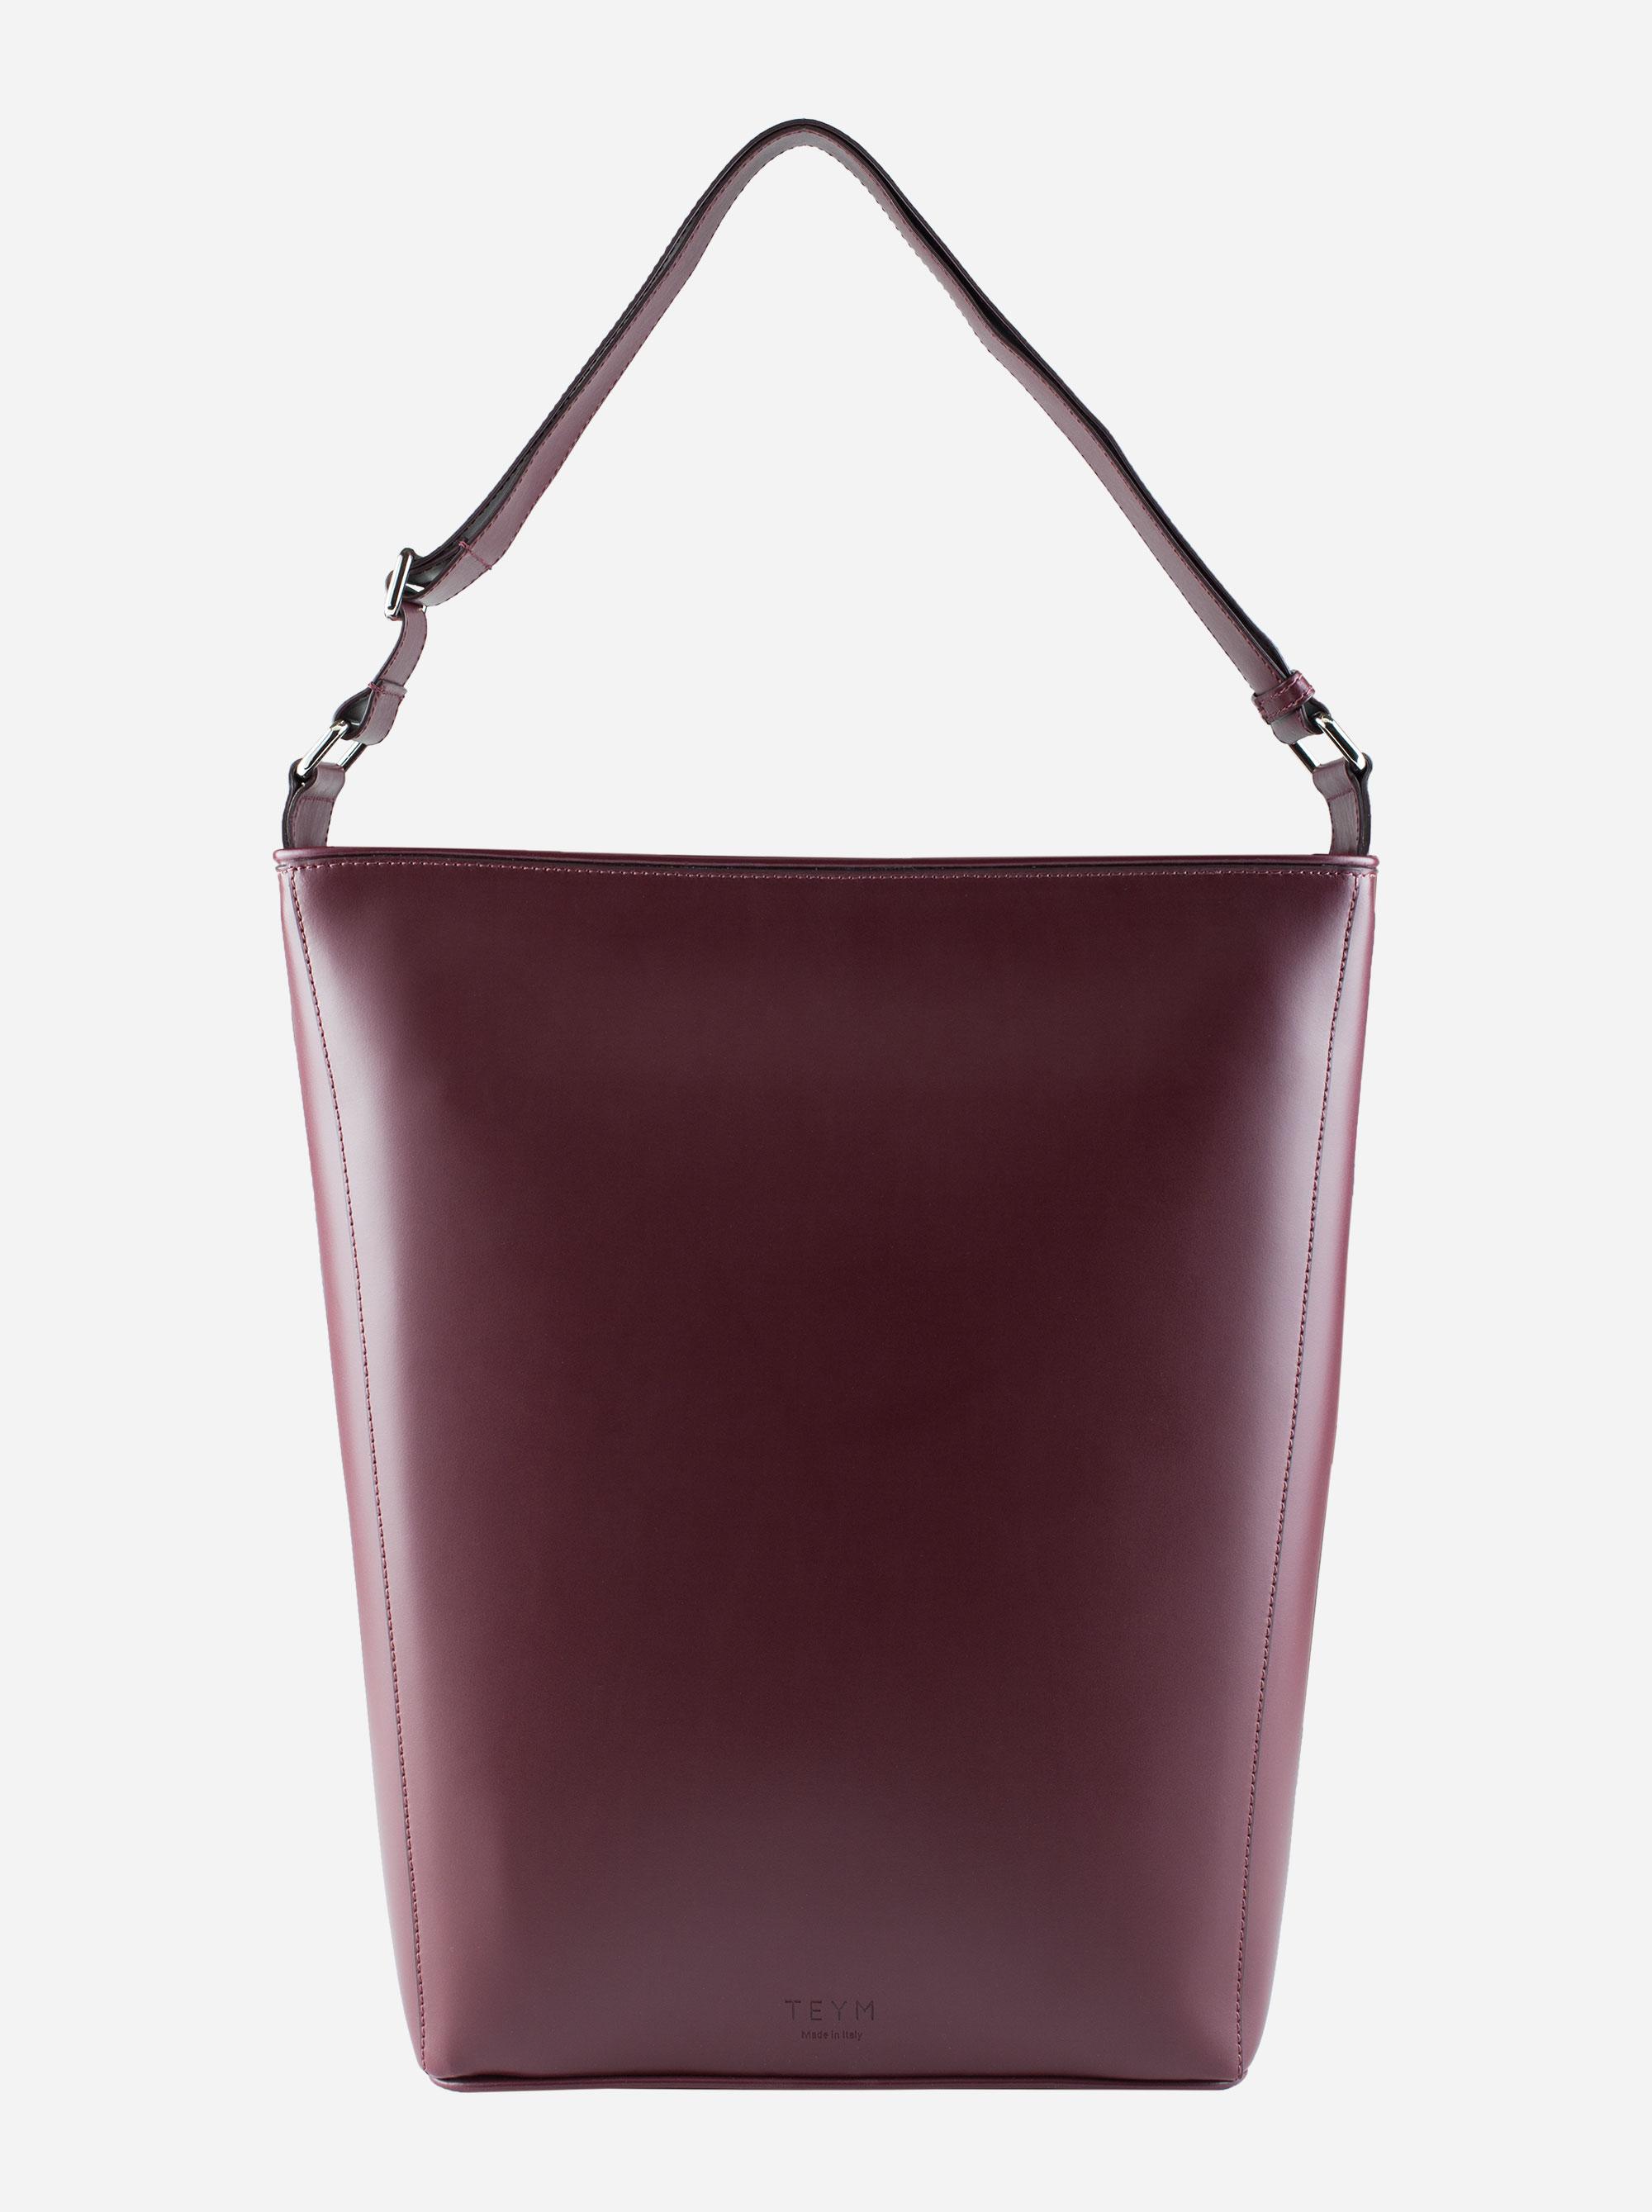 Teym - The Shoulder Bag - Burgundy - 4